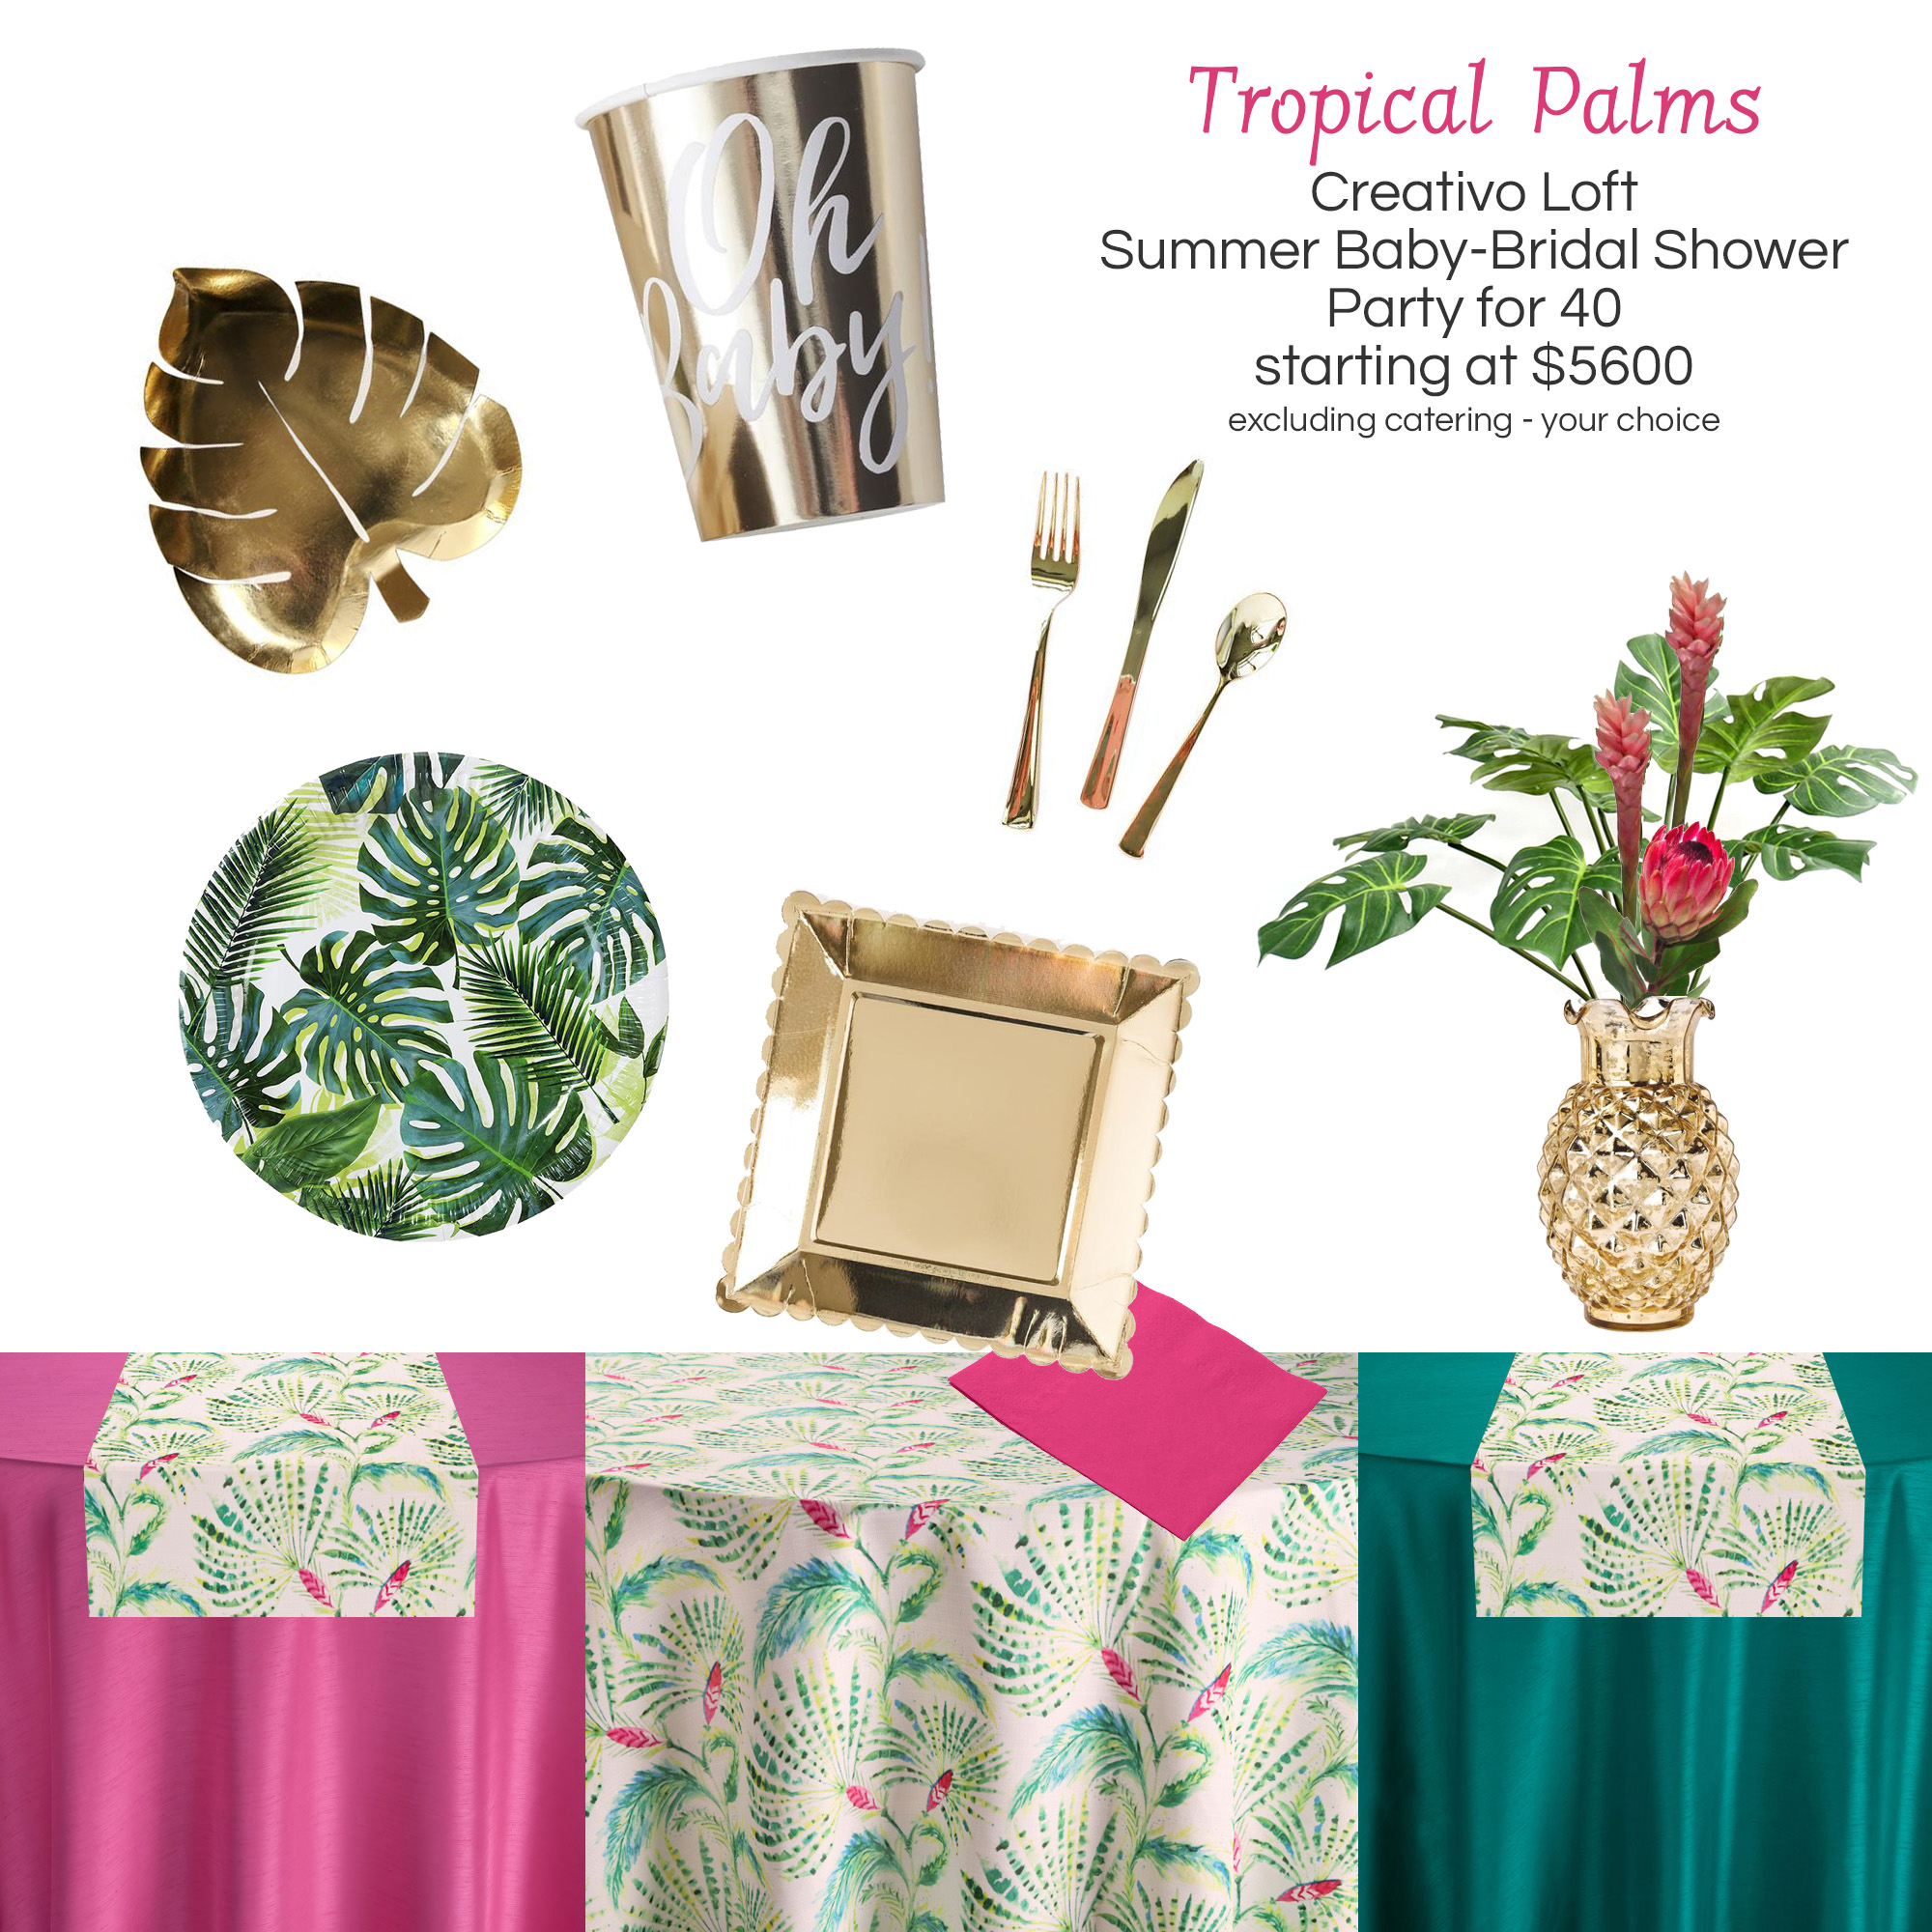 Creativo Loft Tropical Palms Party